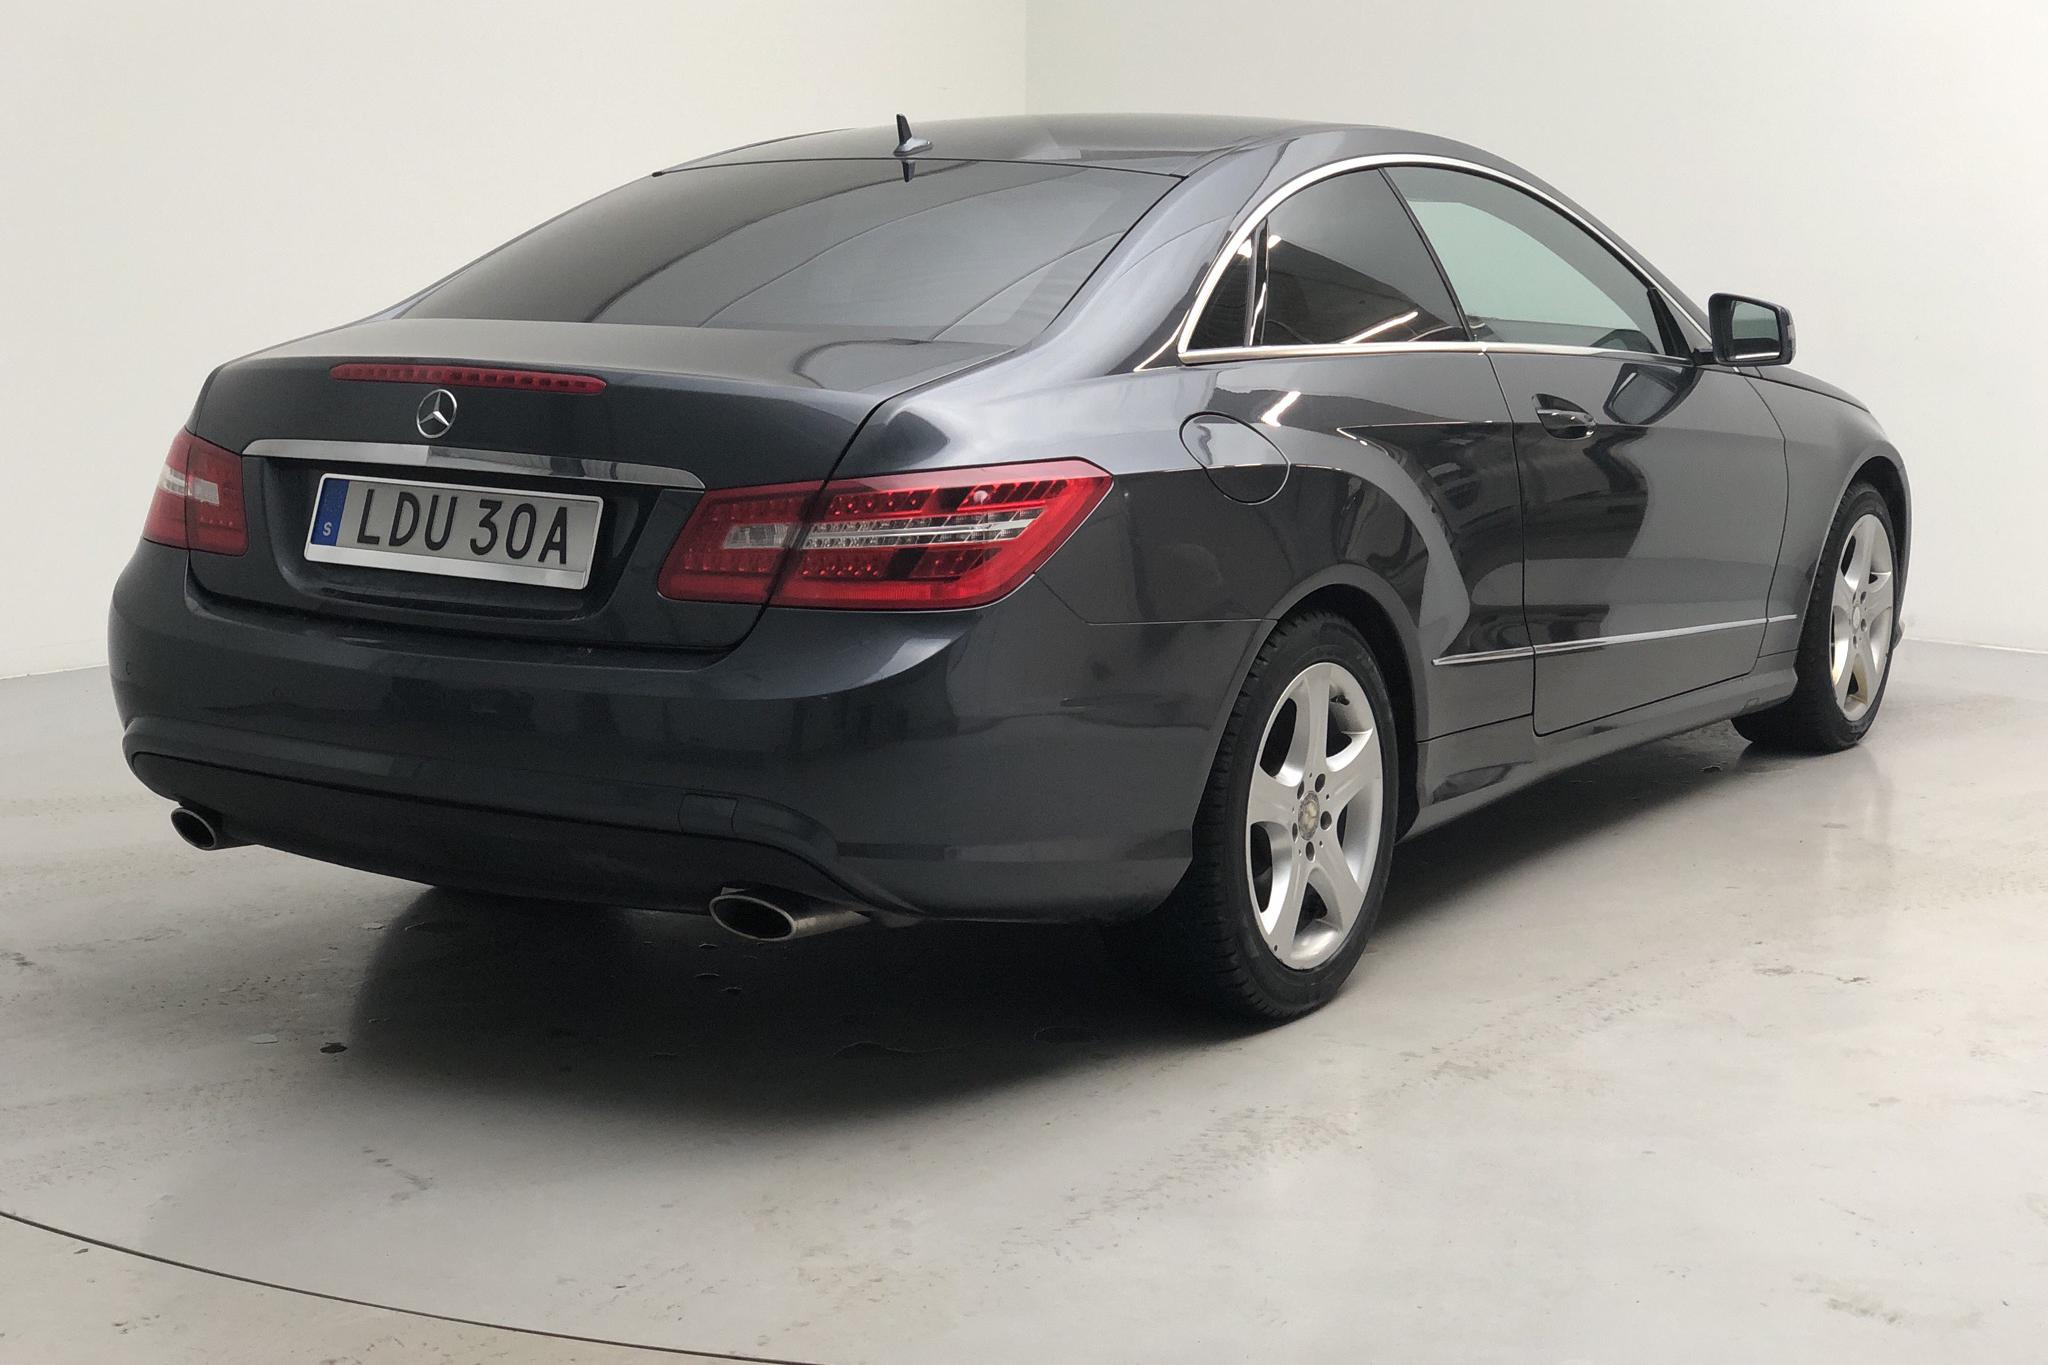 Mercedes E 350 Coupé C207 (306hk) - 121 670 km - Automatic - Dark Grey - 2013